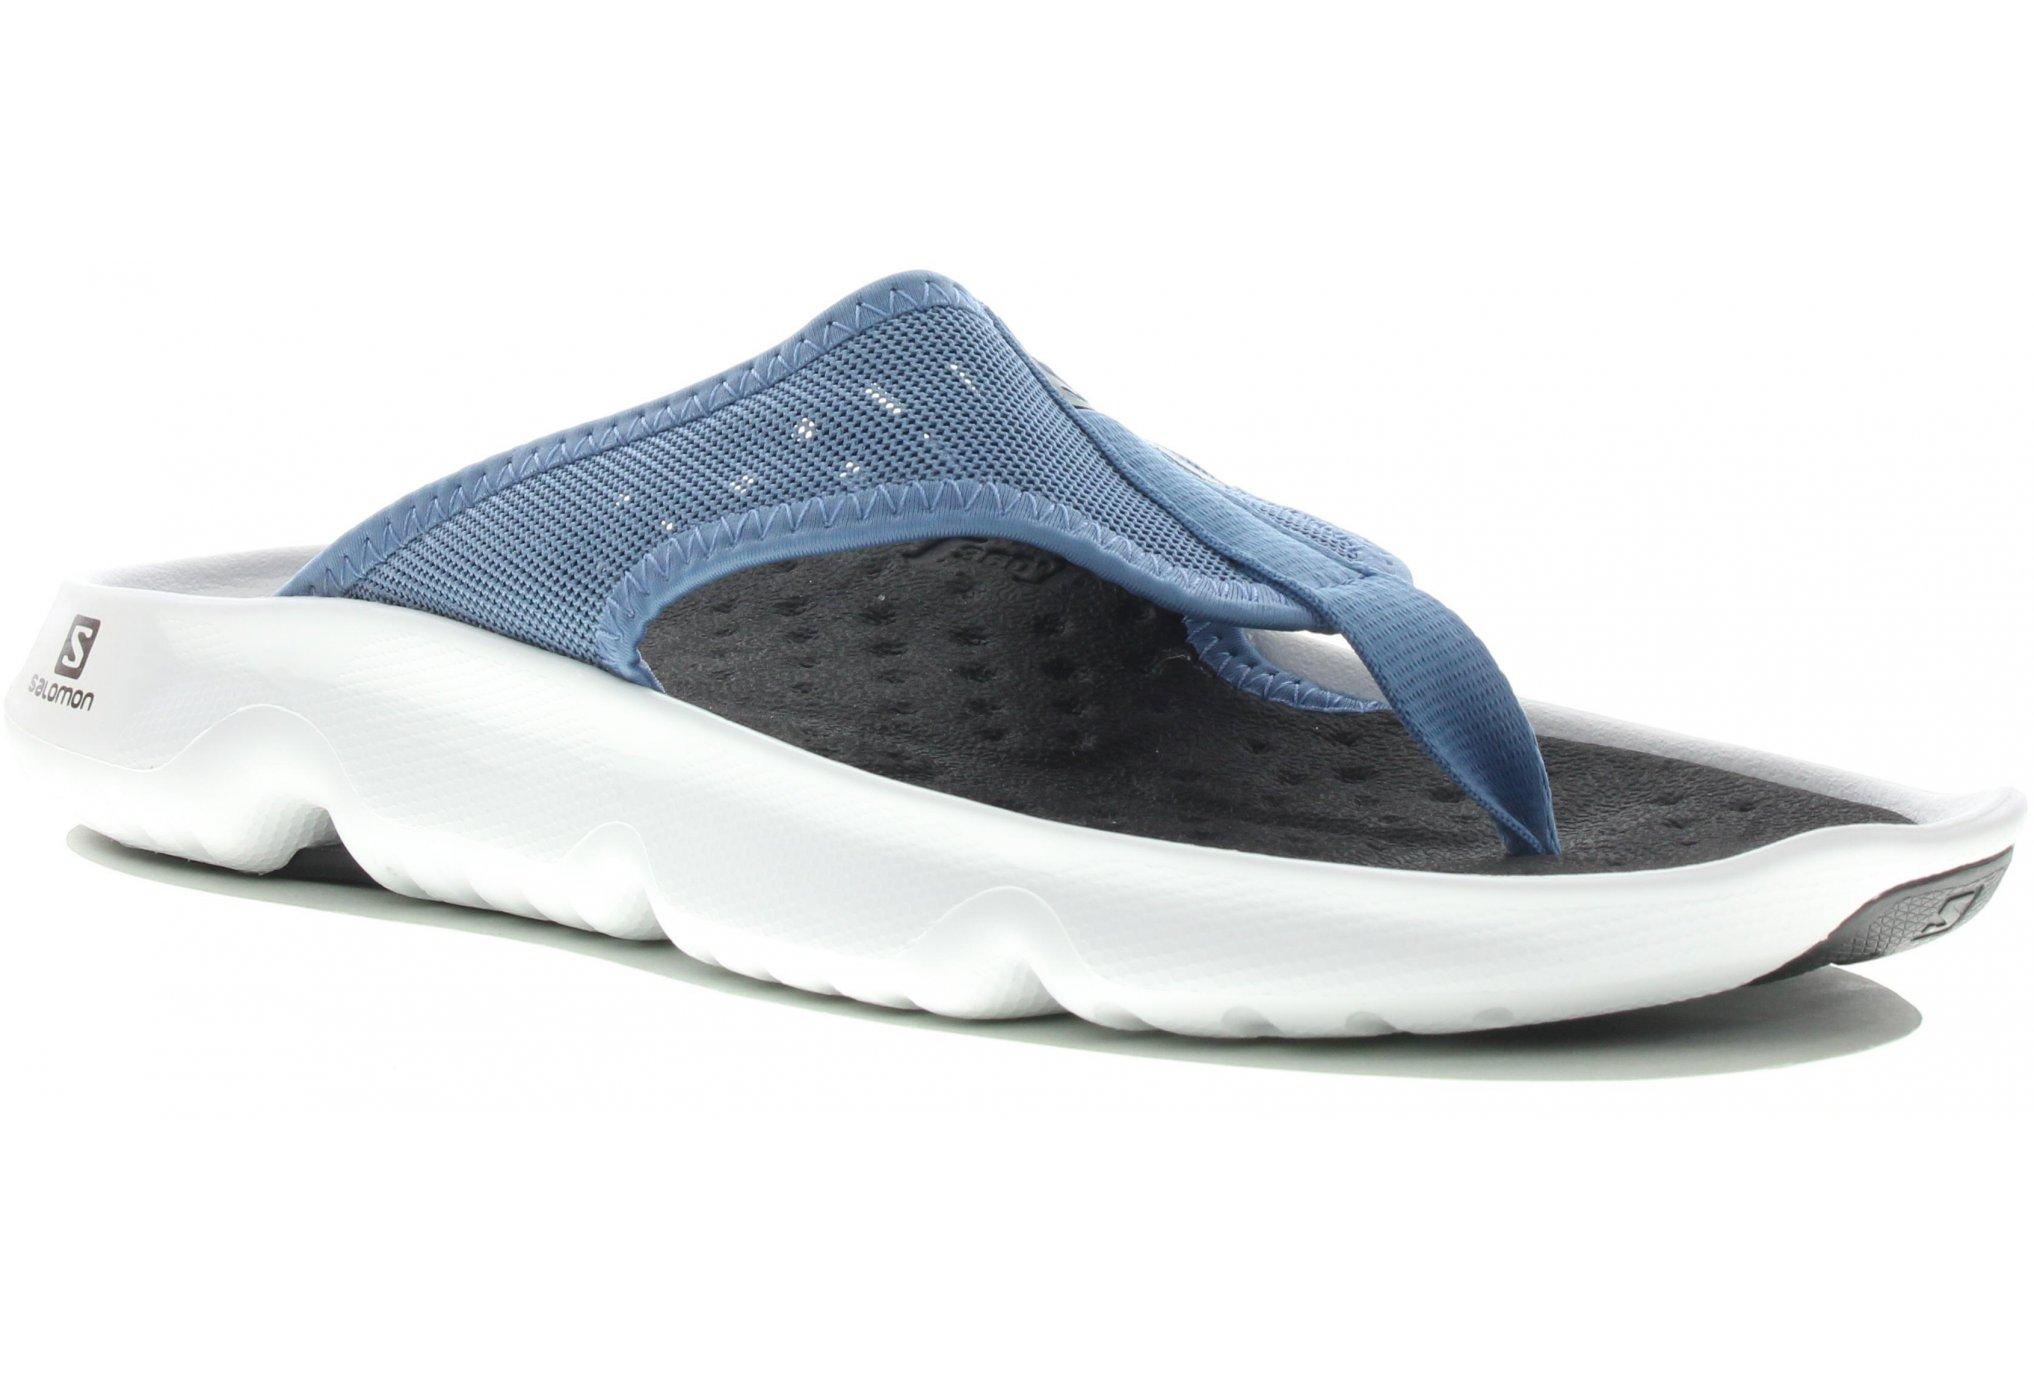 Salomon Reelax Break 5.0 M Chaussures homme